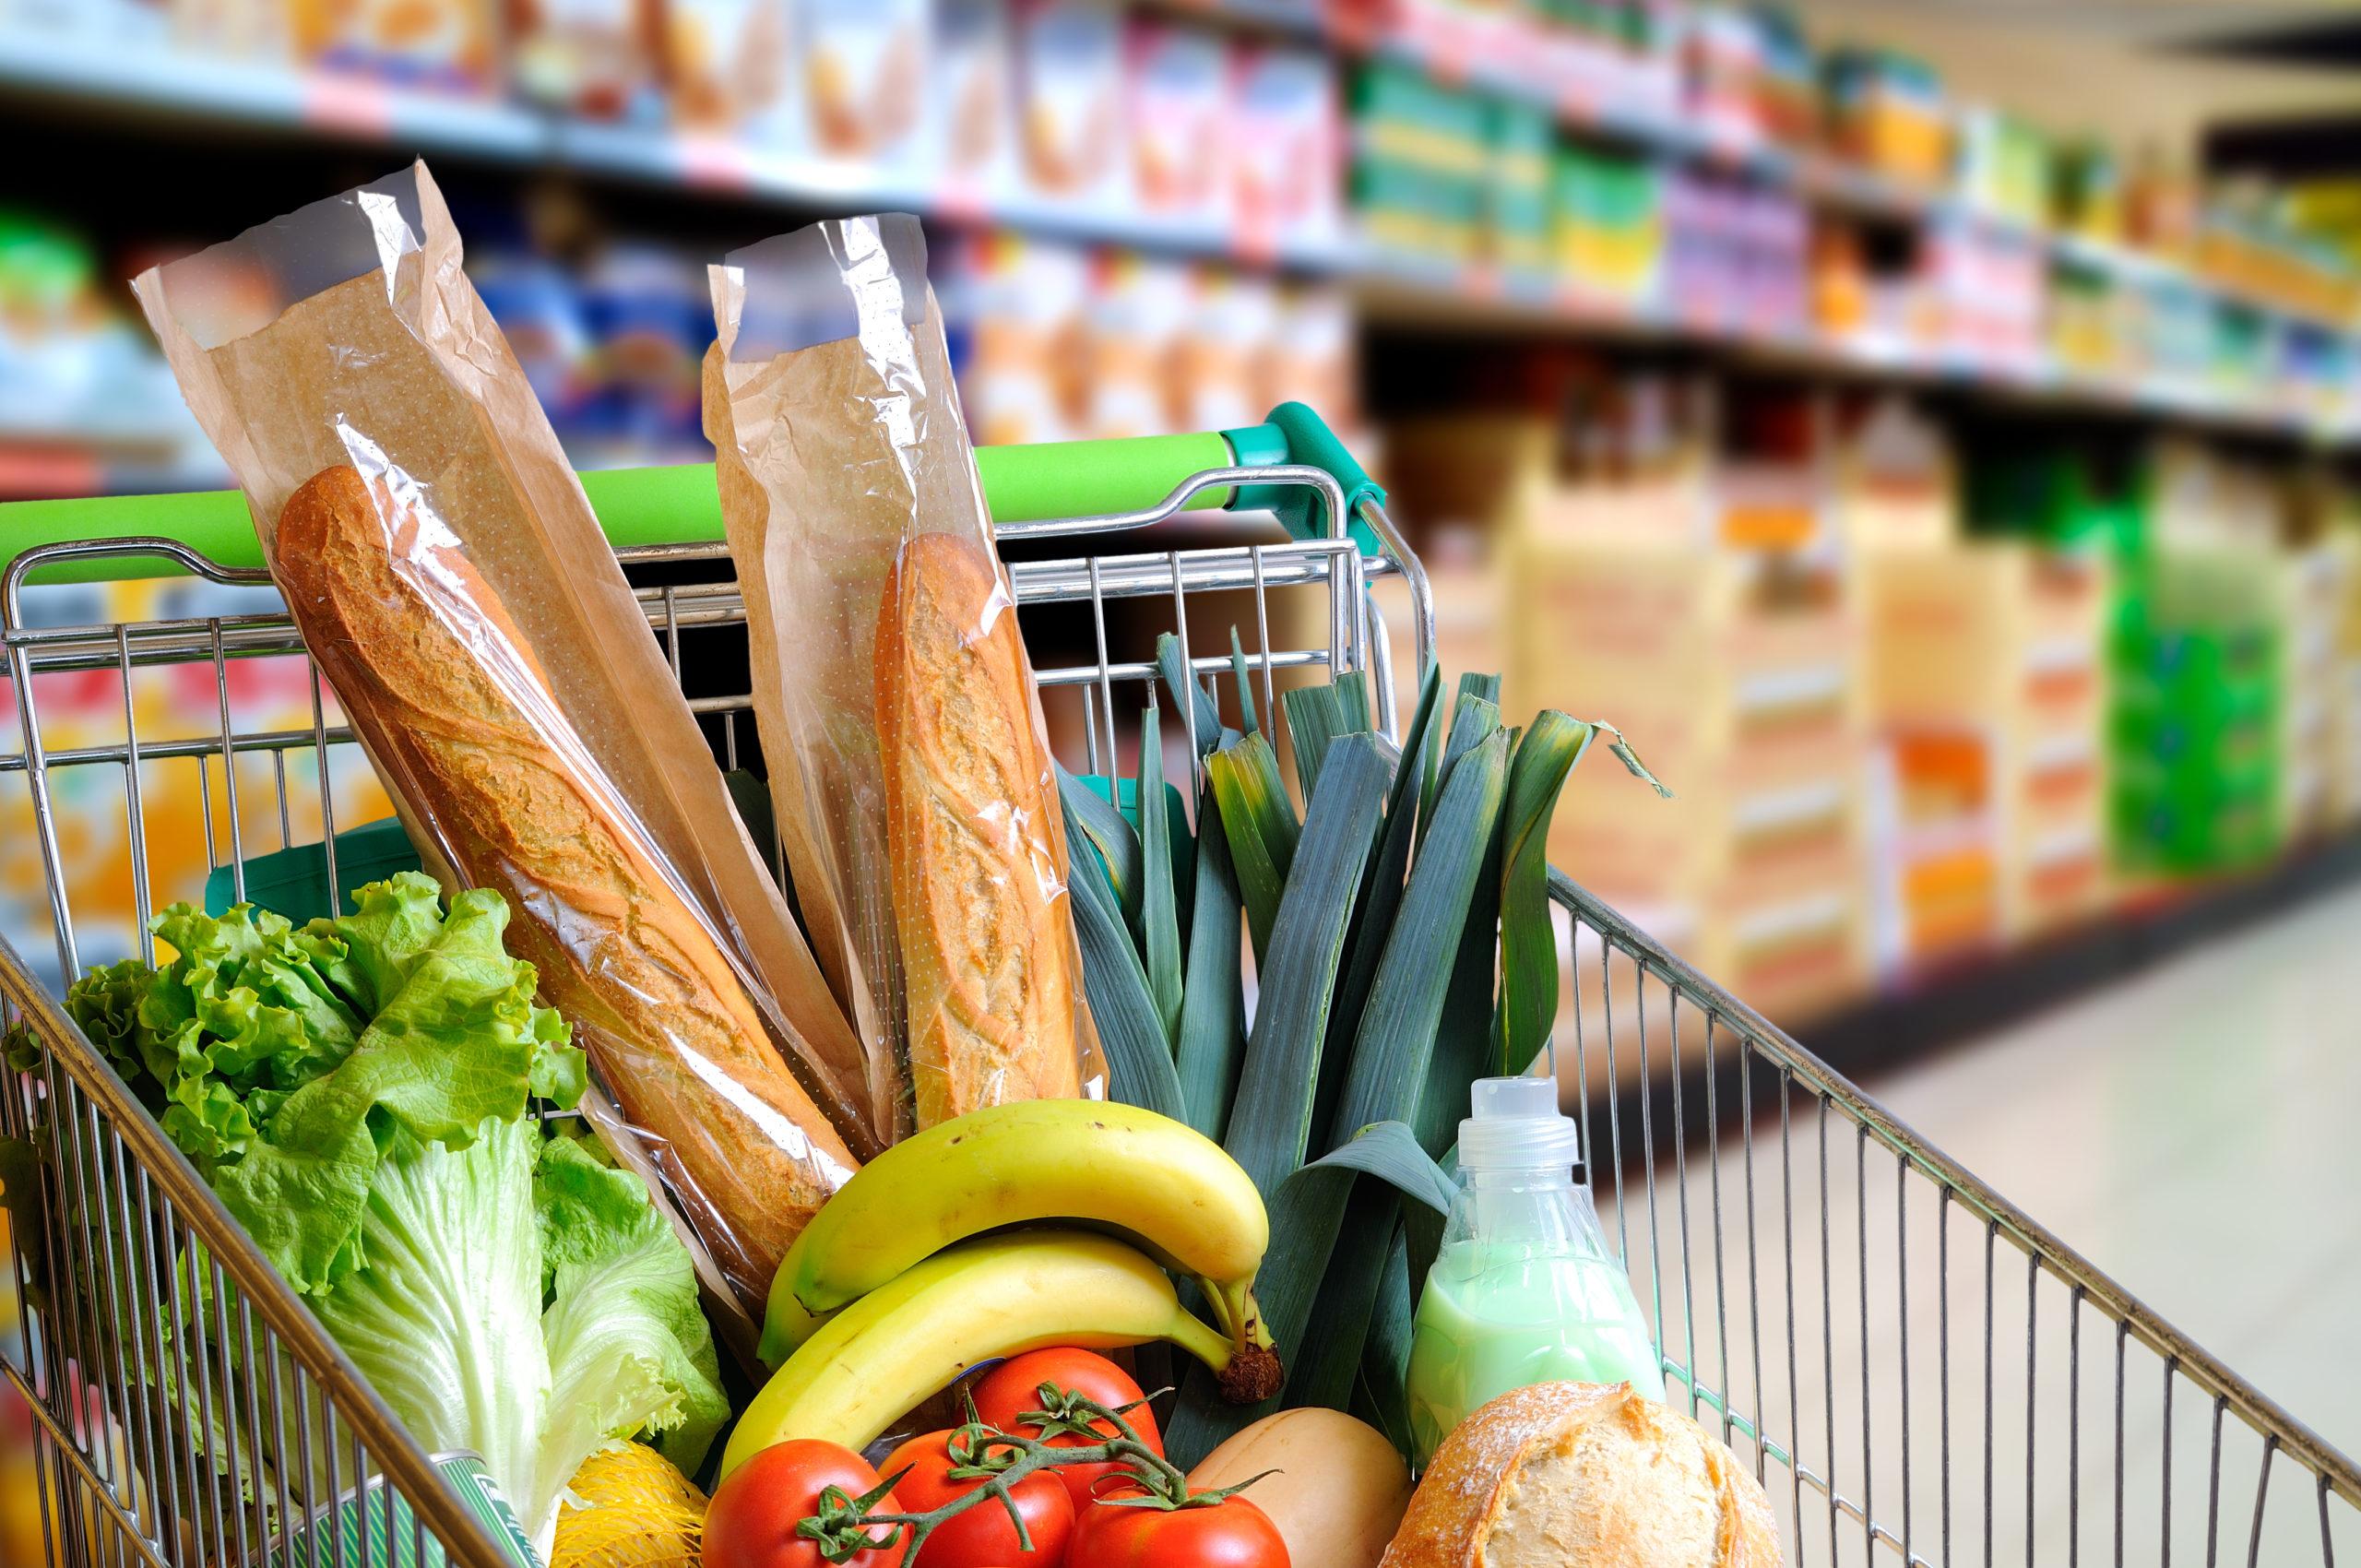 ФАС России дал прогноз по стабилизации цен на имбирь, чеснок и лимоны